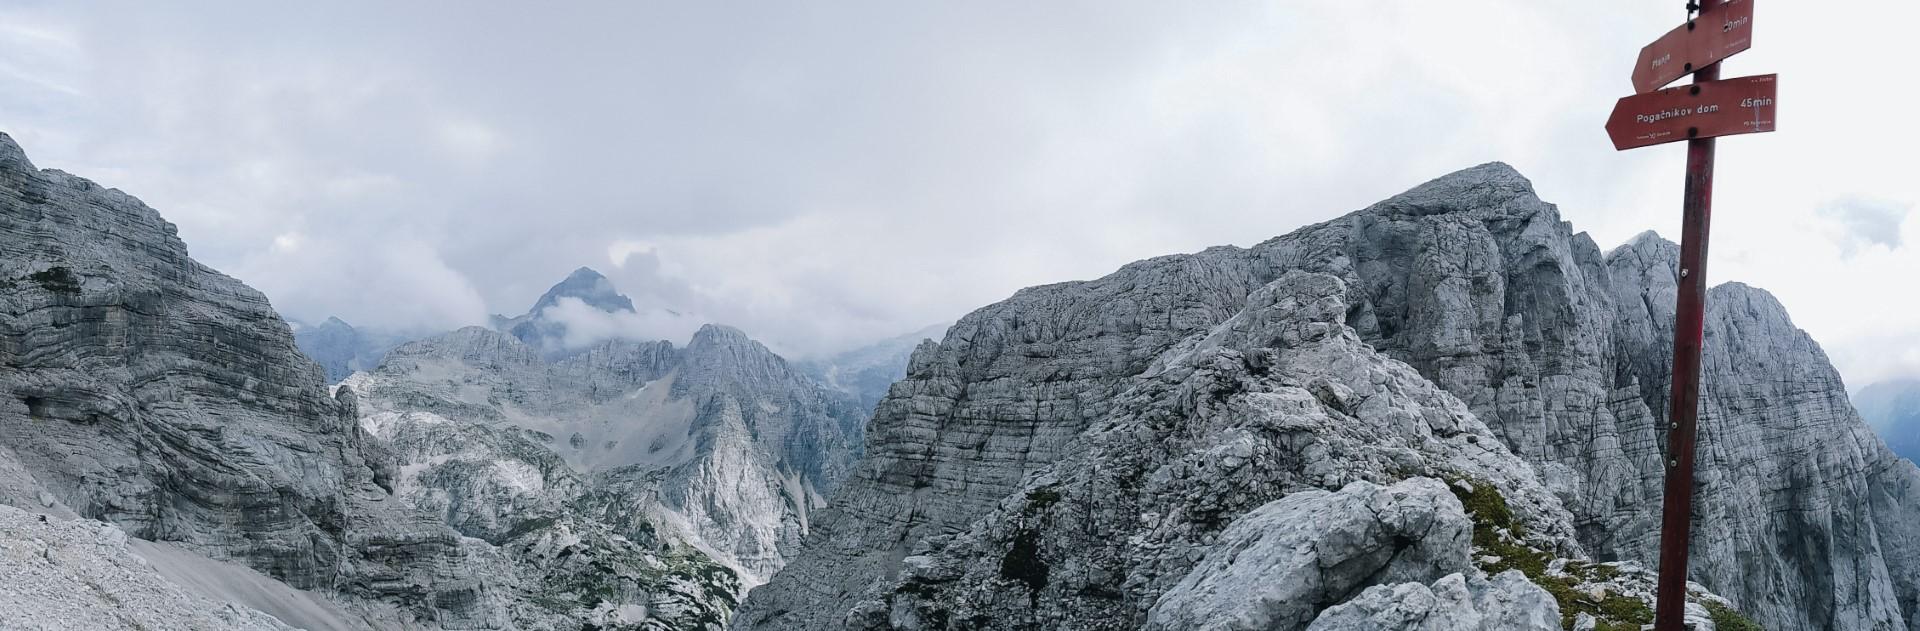 Widok na Alpy Julijskie i Triglav ze szlaku na Razor.